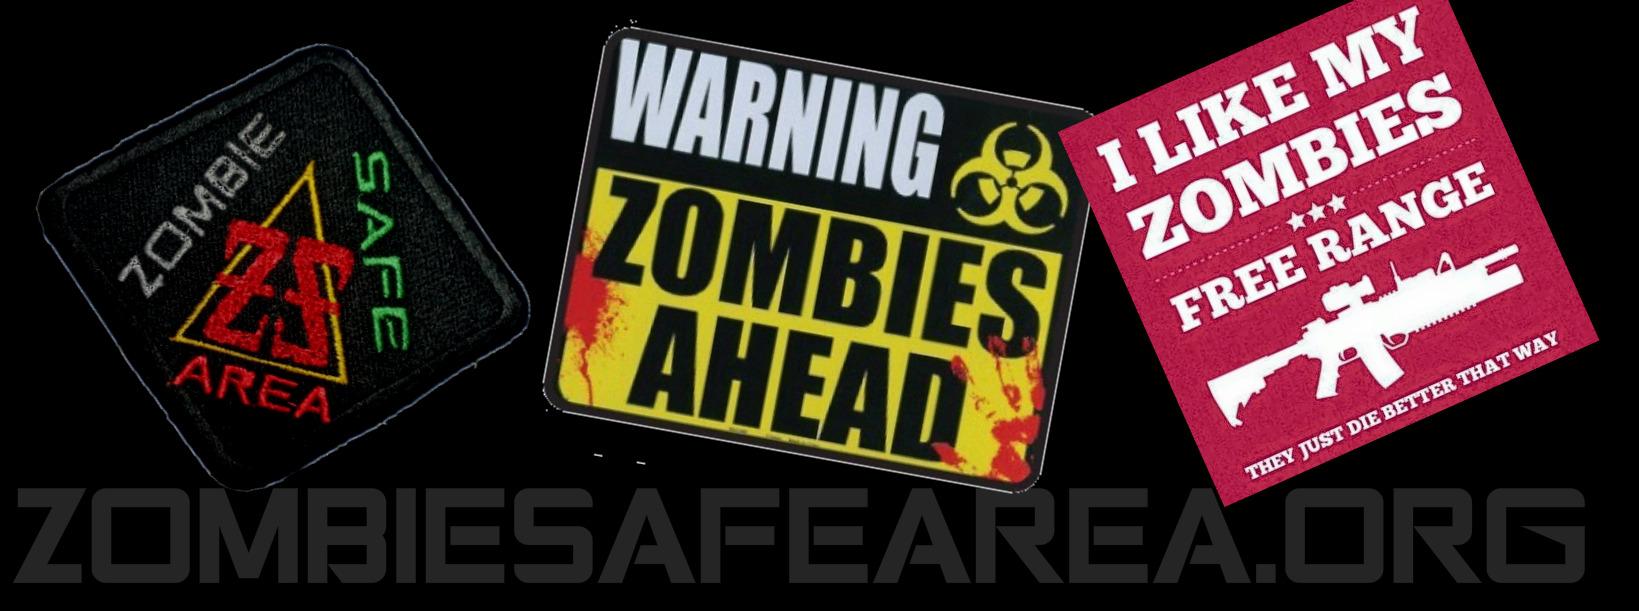 ZSA Zombie Outbreak